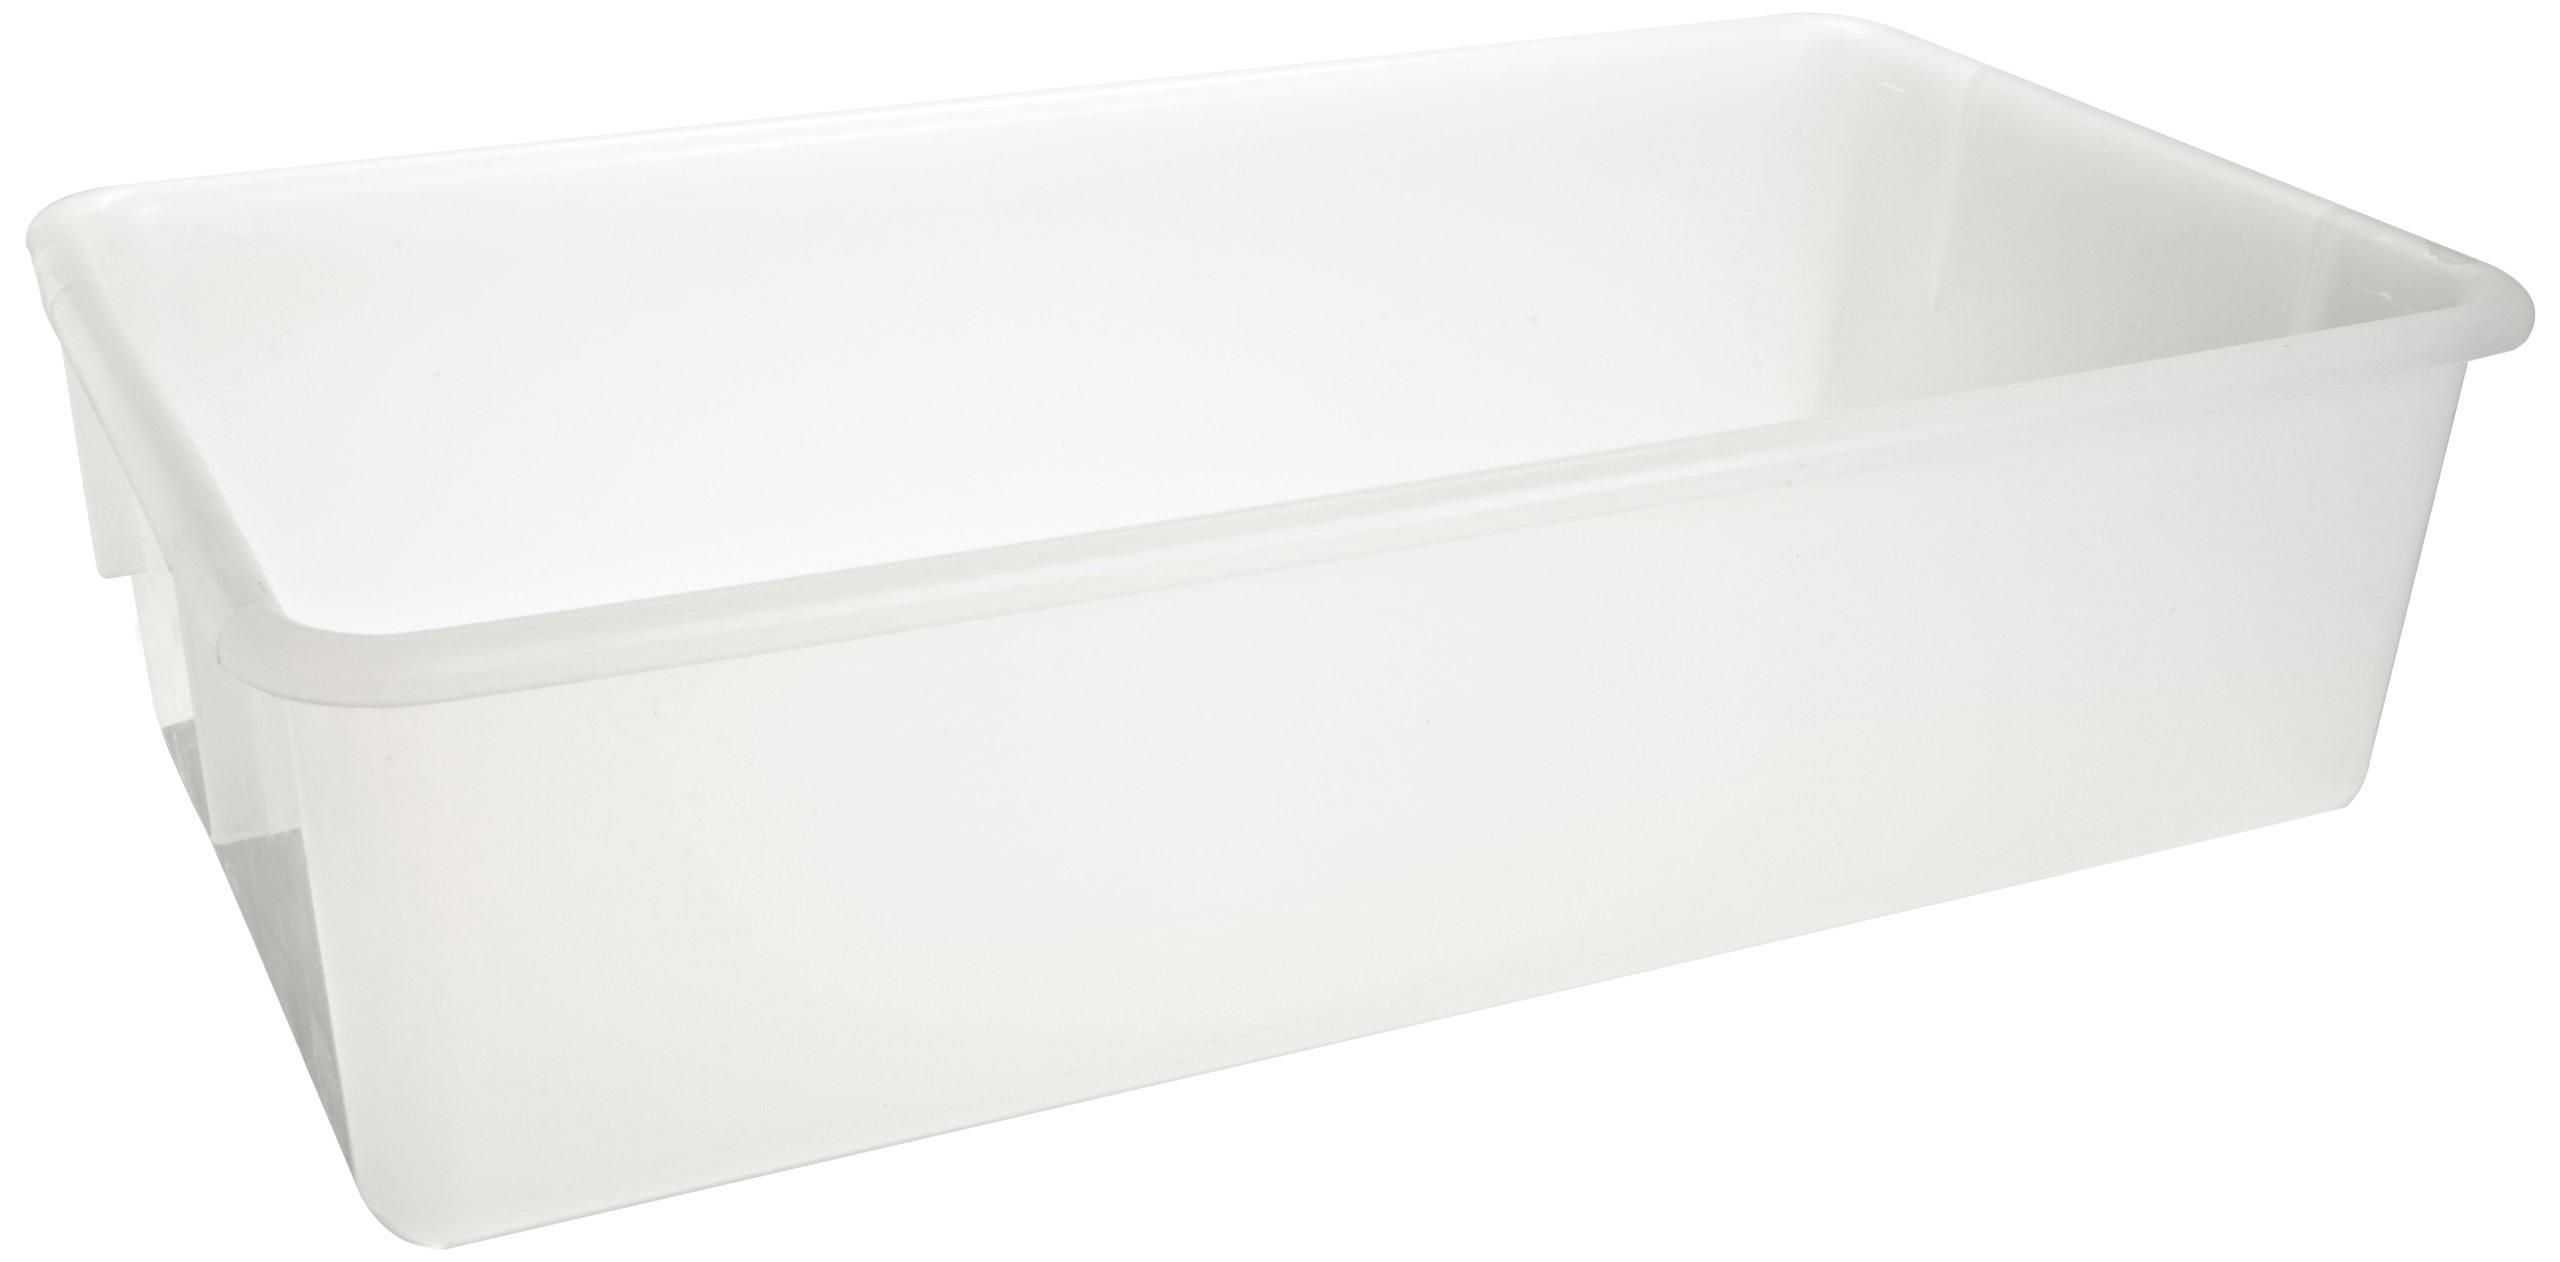 Bel-Art Polypropylene Sterilizing Tray; 19 x 10½ x 5 in. (H16262-0000)